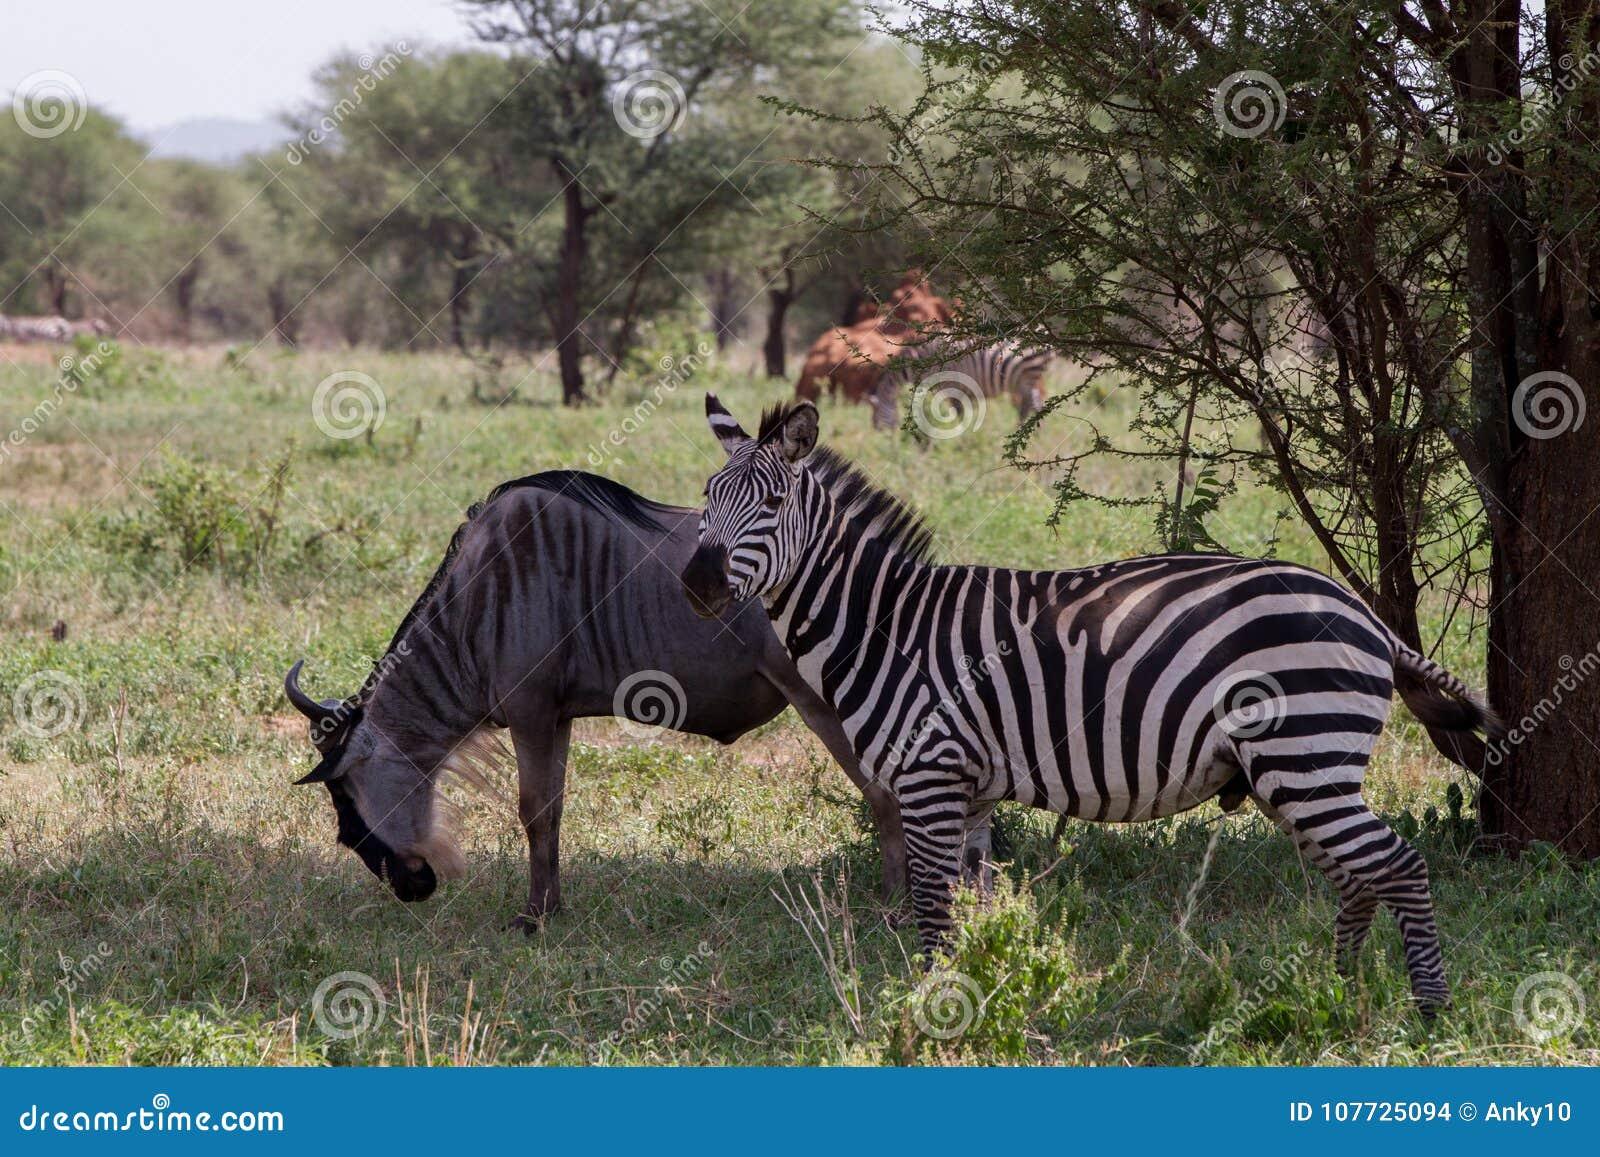 Blue wildebeest and zebras n the Tarangire National Park, Tanzania